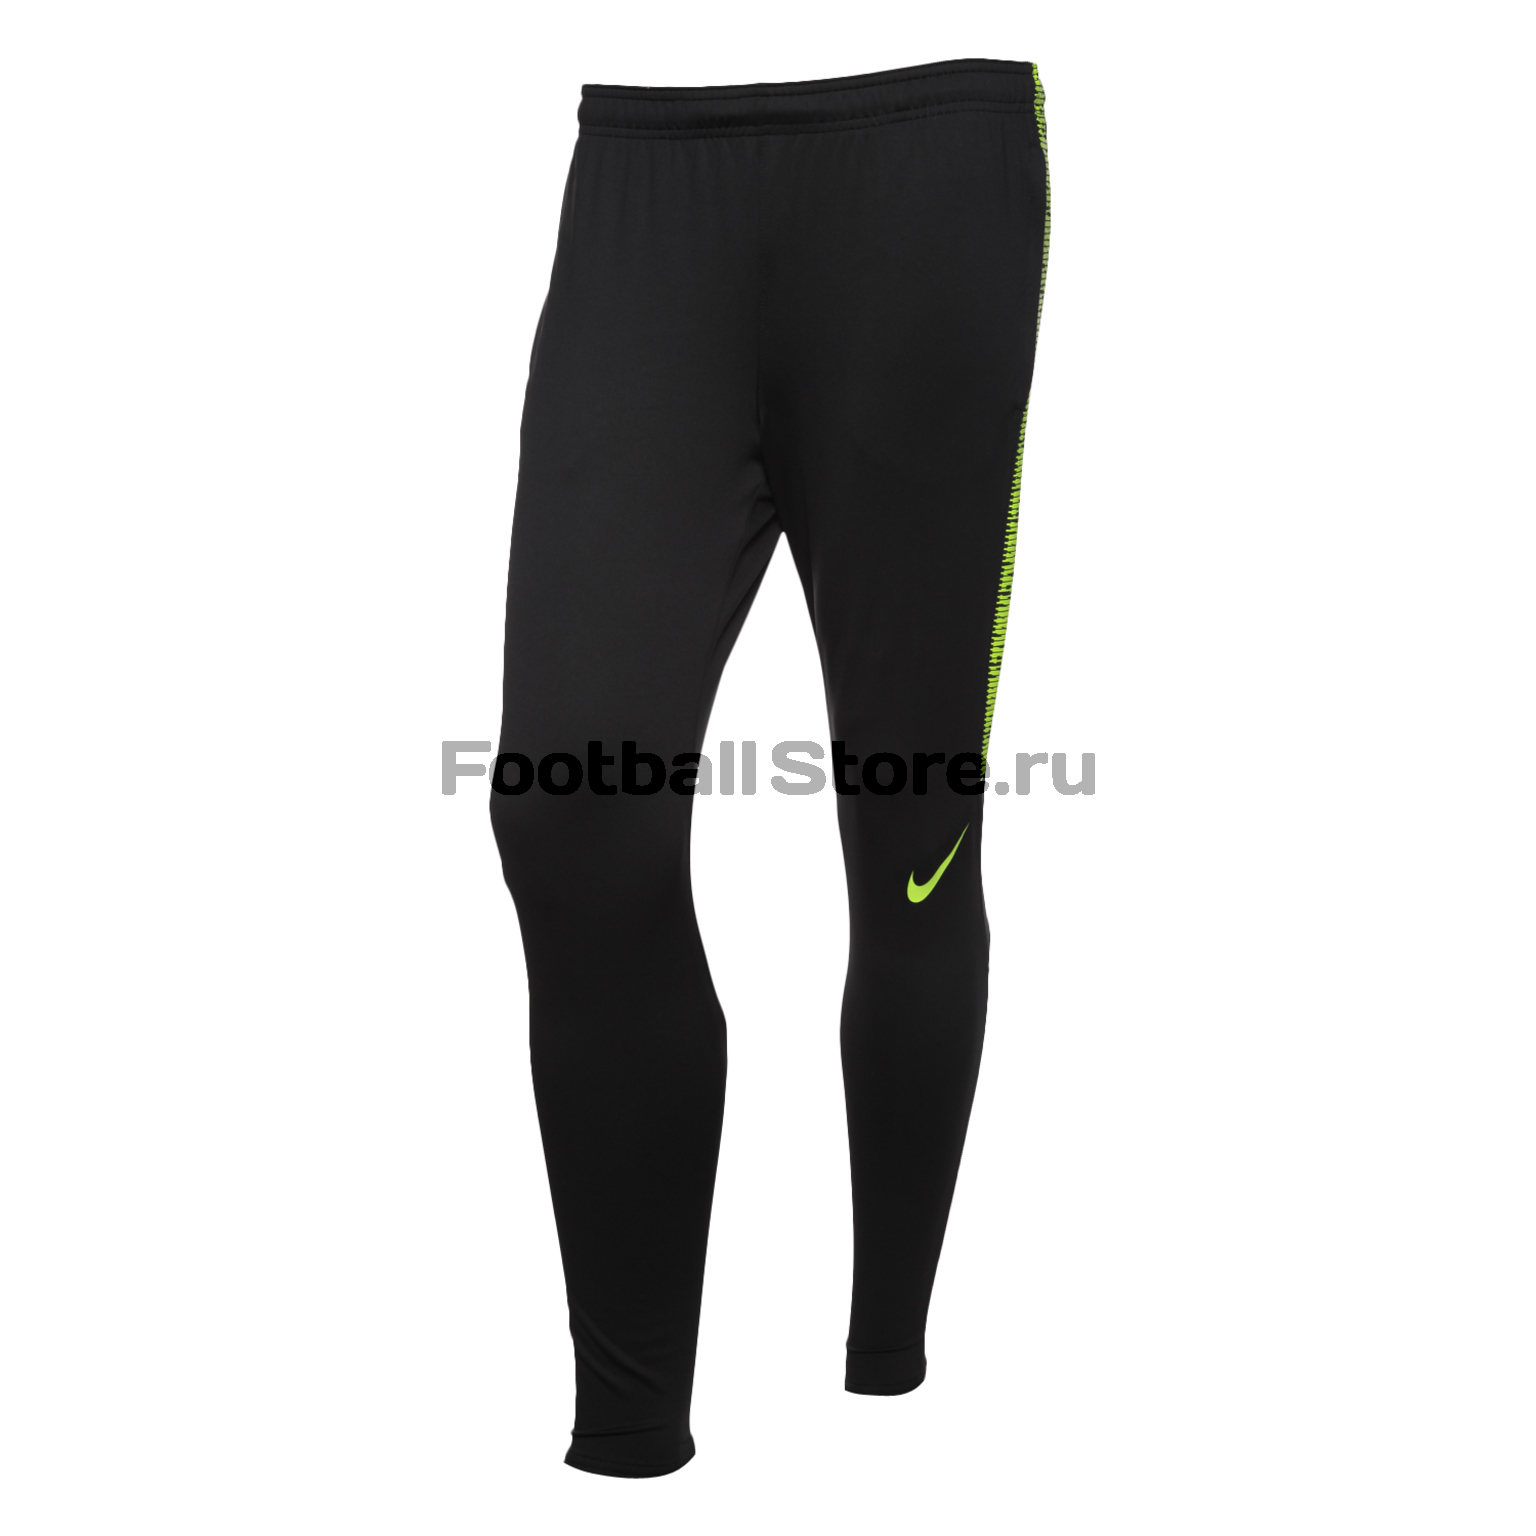 Брюки тренировочные Nike Dry Pant 859225-018 детские бутсы nike бутсы nike jr phantom 3 elite df fg ah7292 081